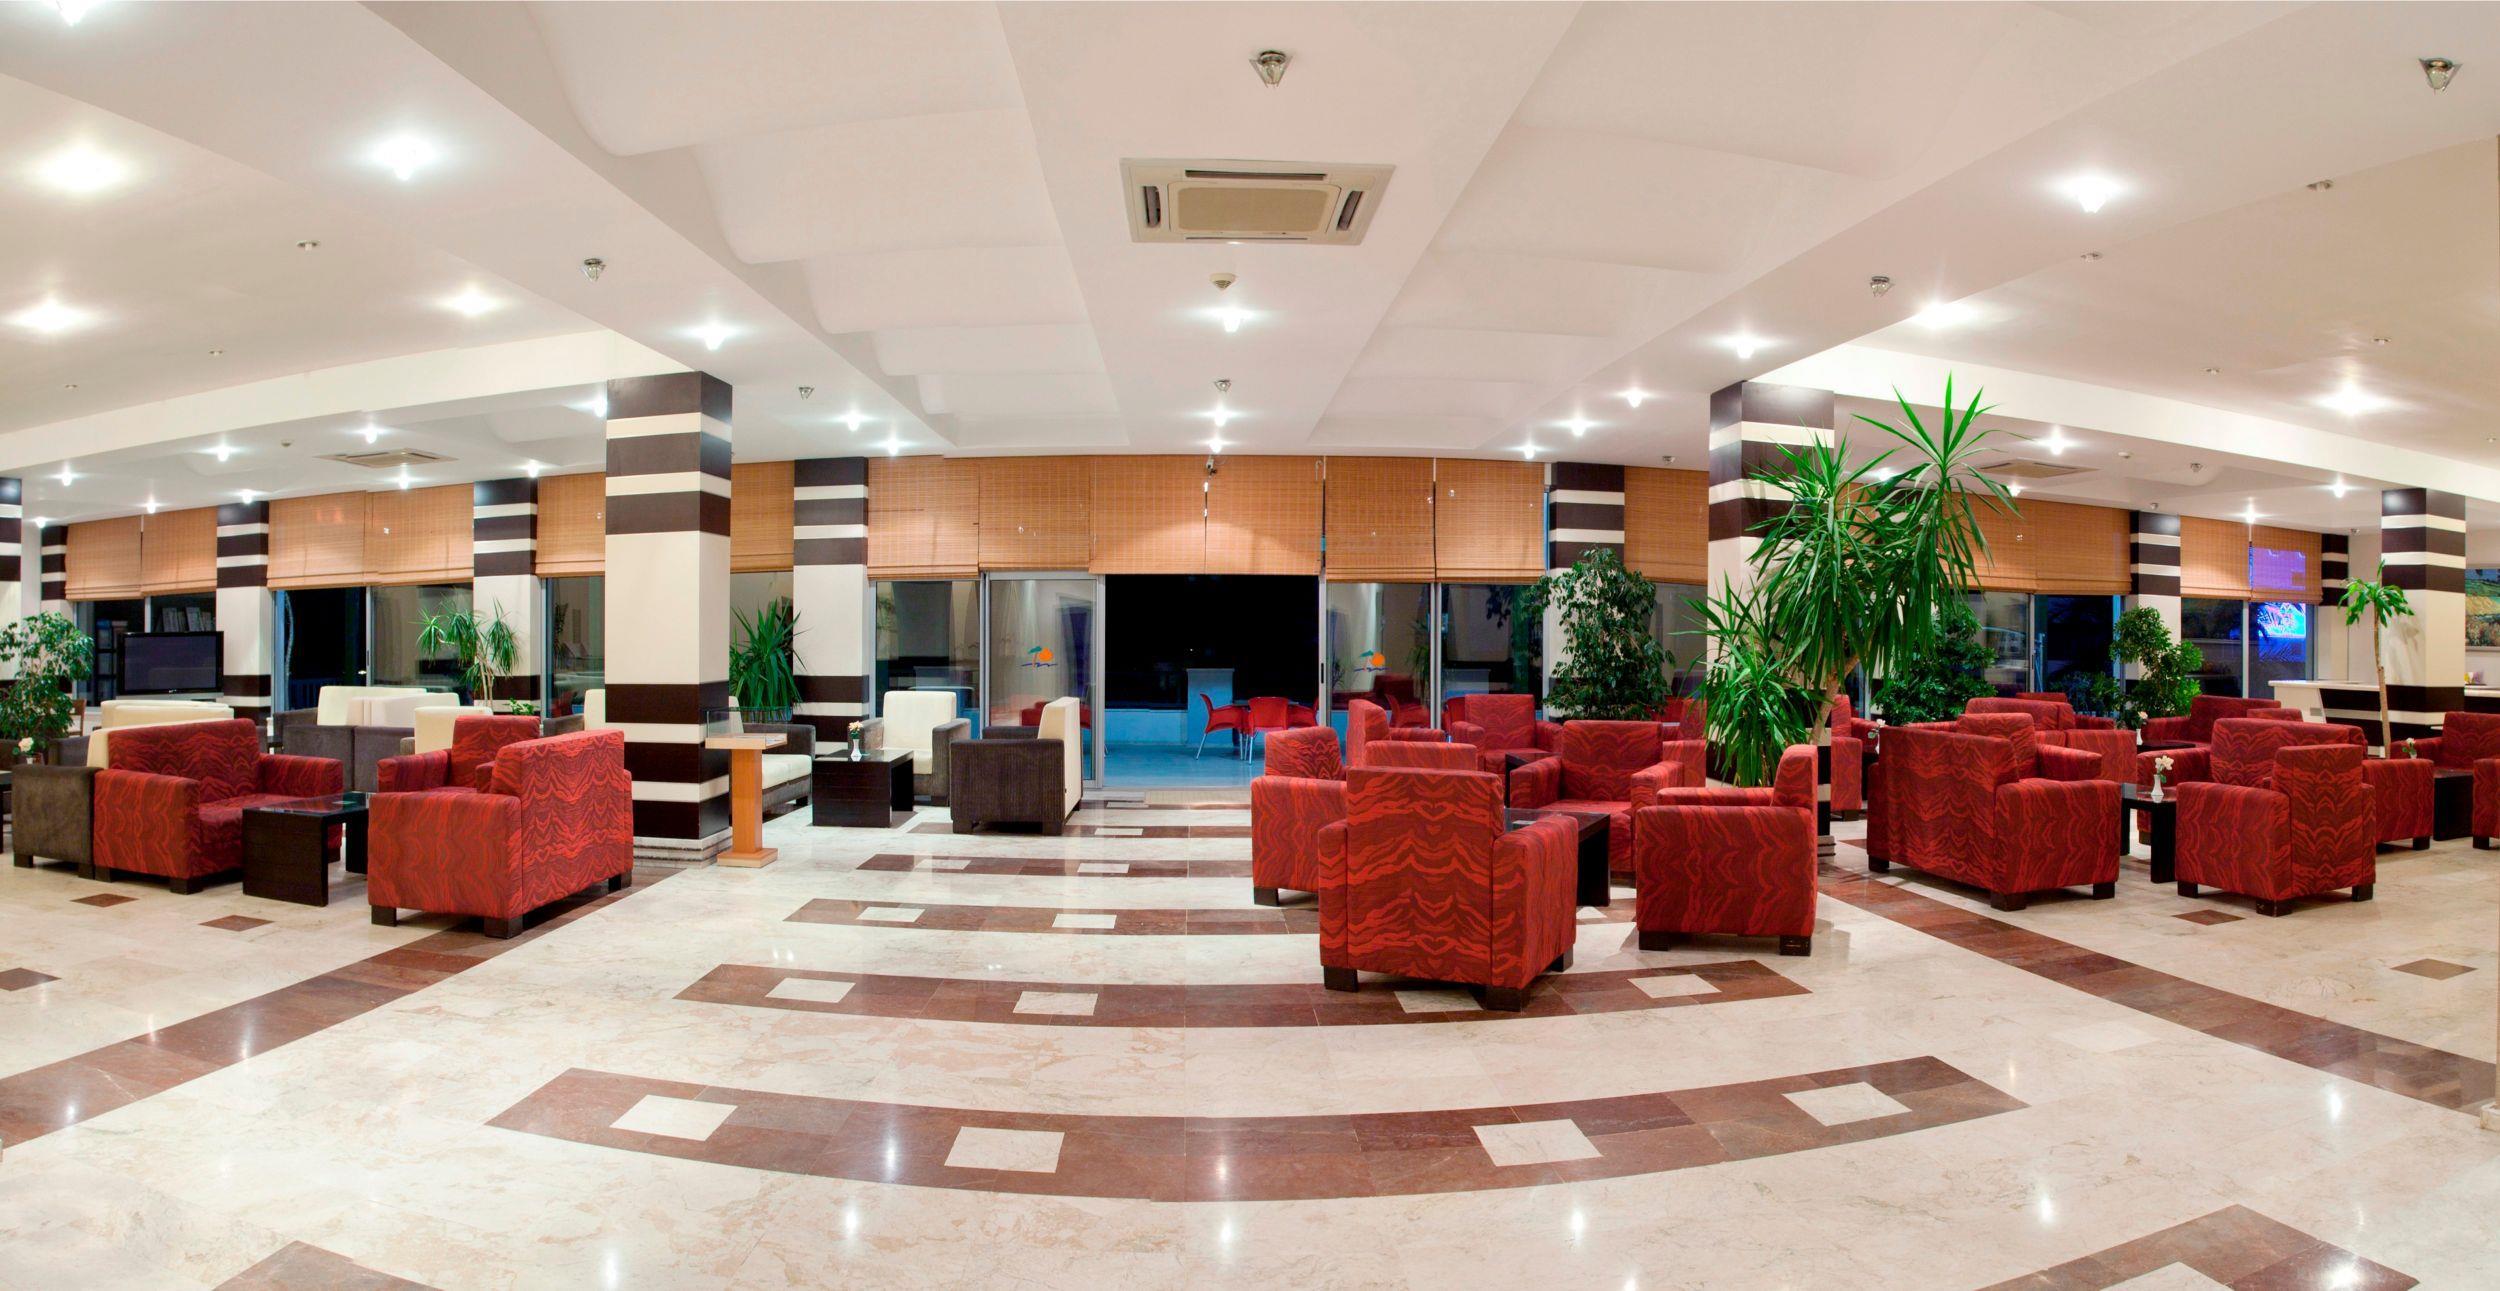 http://www.orextravel.sk/OREX/hotelphotos/seher-sun-beach-general-0013.jpg